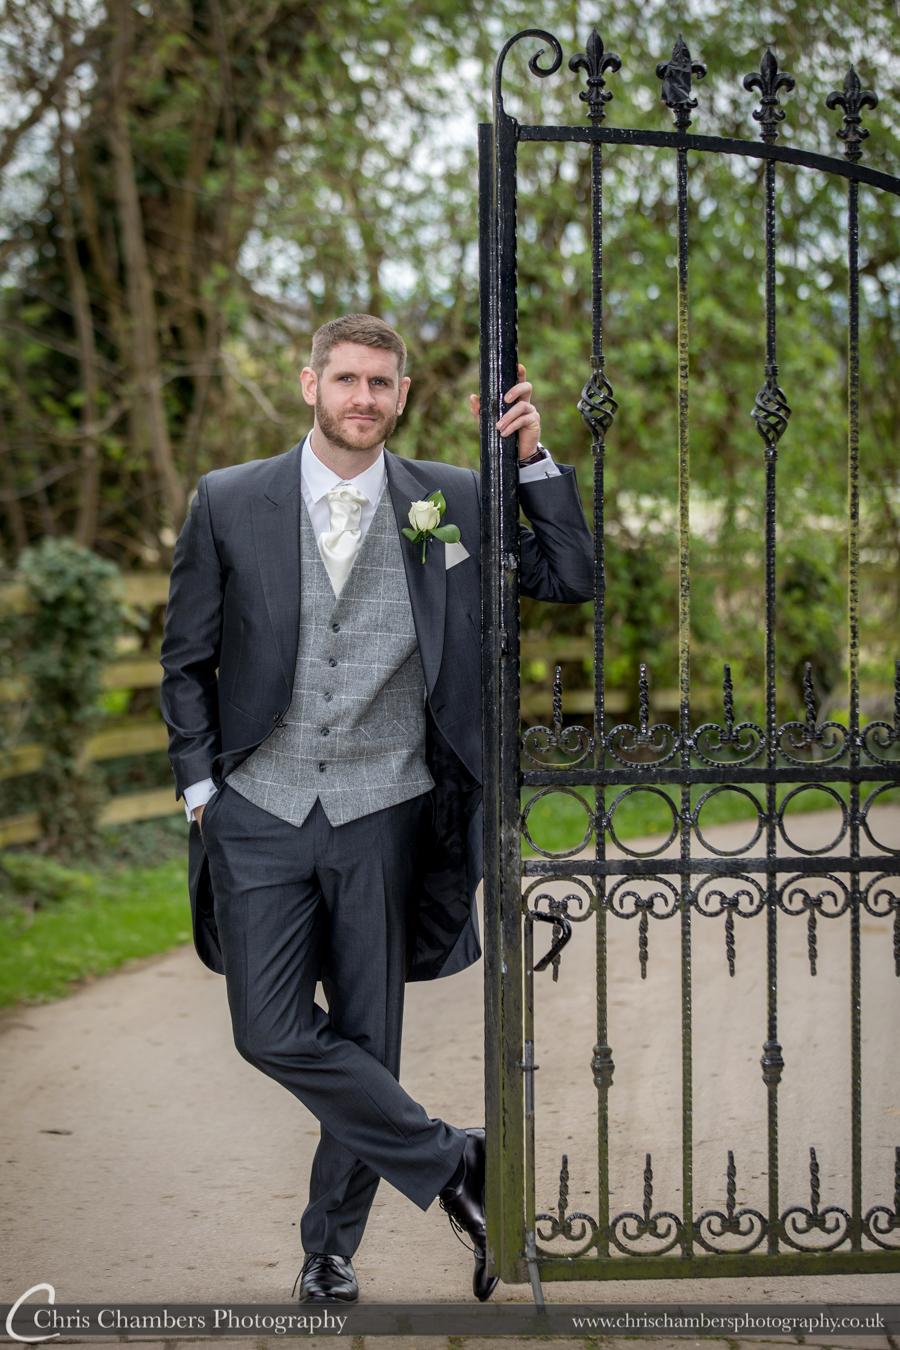 Hazlewood Castle wedding photography, North Yorkshire wedding photographer, Chris Chambers photography, Award Winning Wedding Photographer